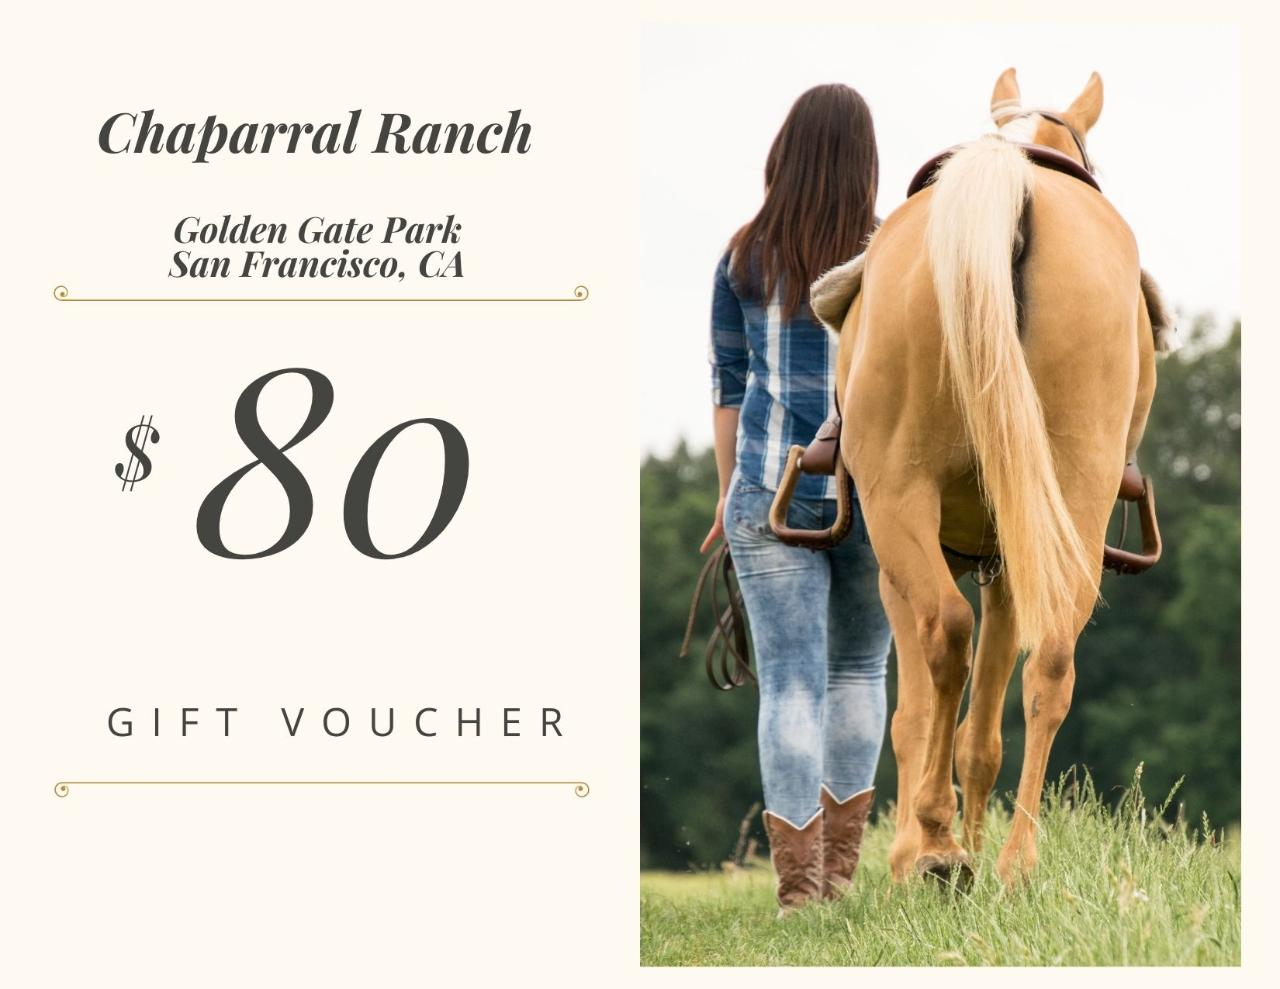 $80 Gift Card - Golden Gate Park